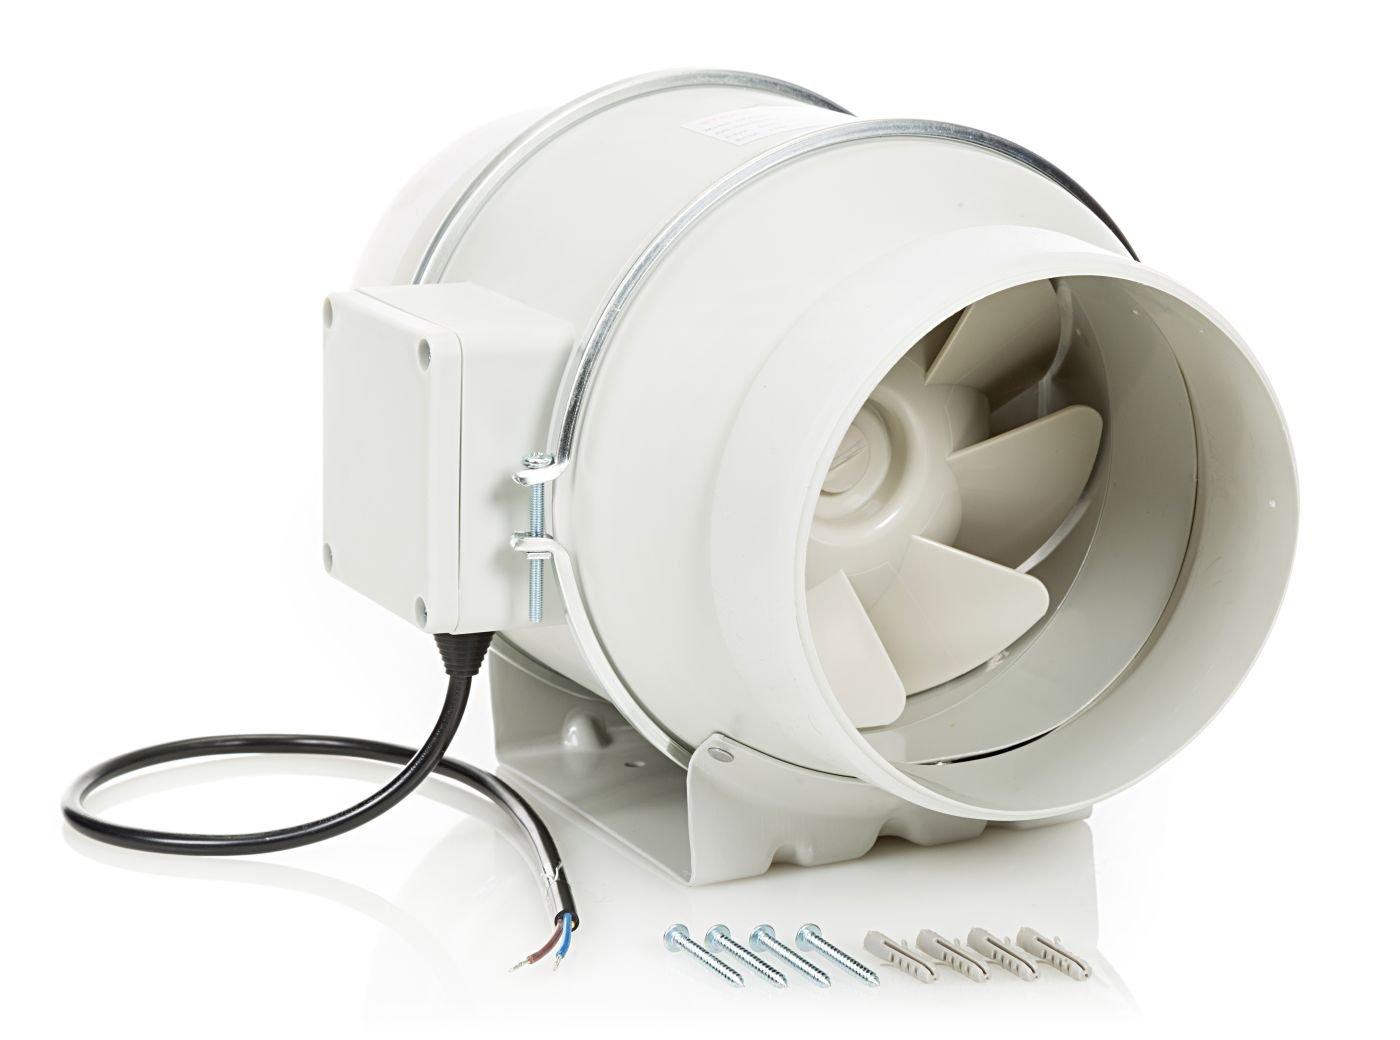 DFA150 Rohrventilator Kanalventilator 150-160 mm STERR